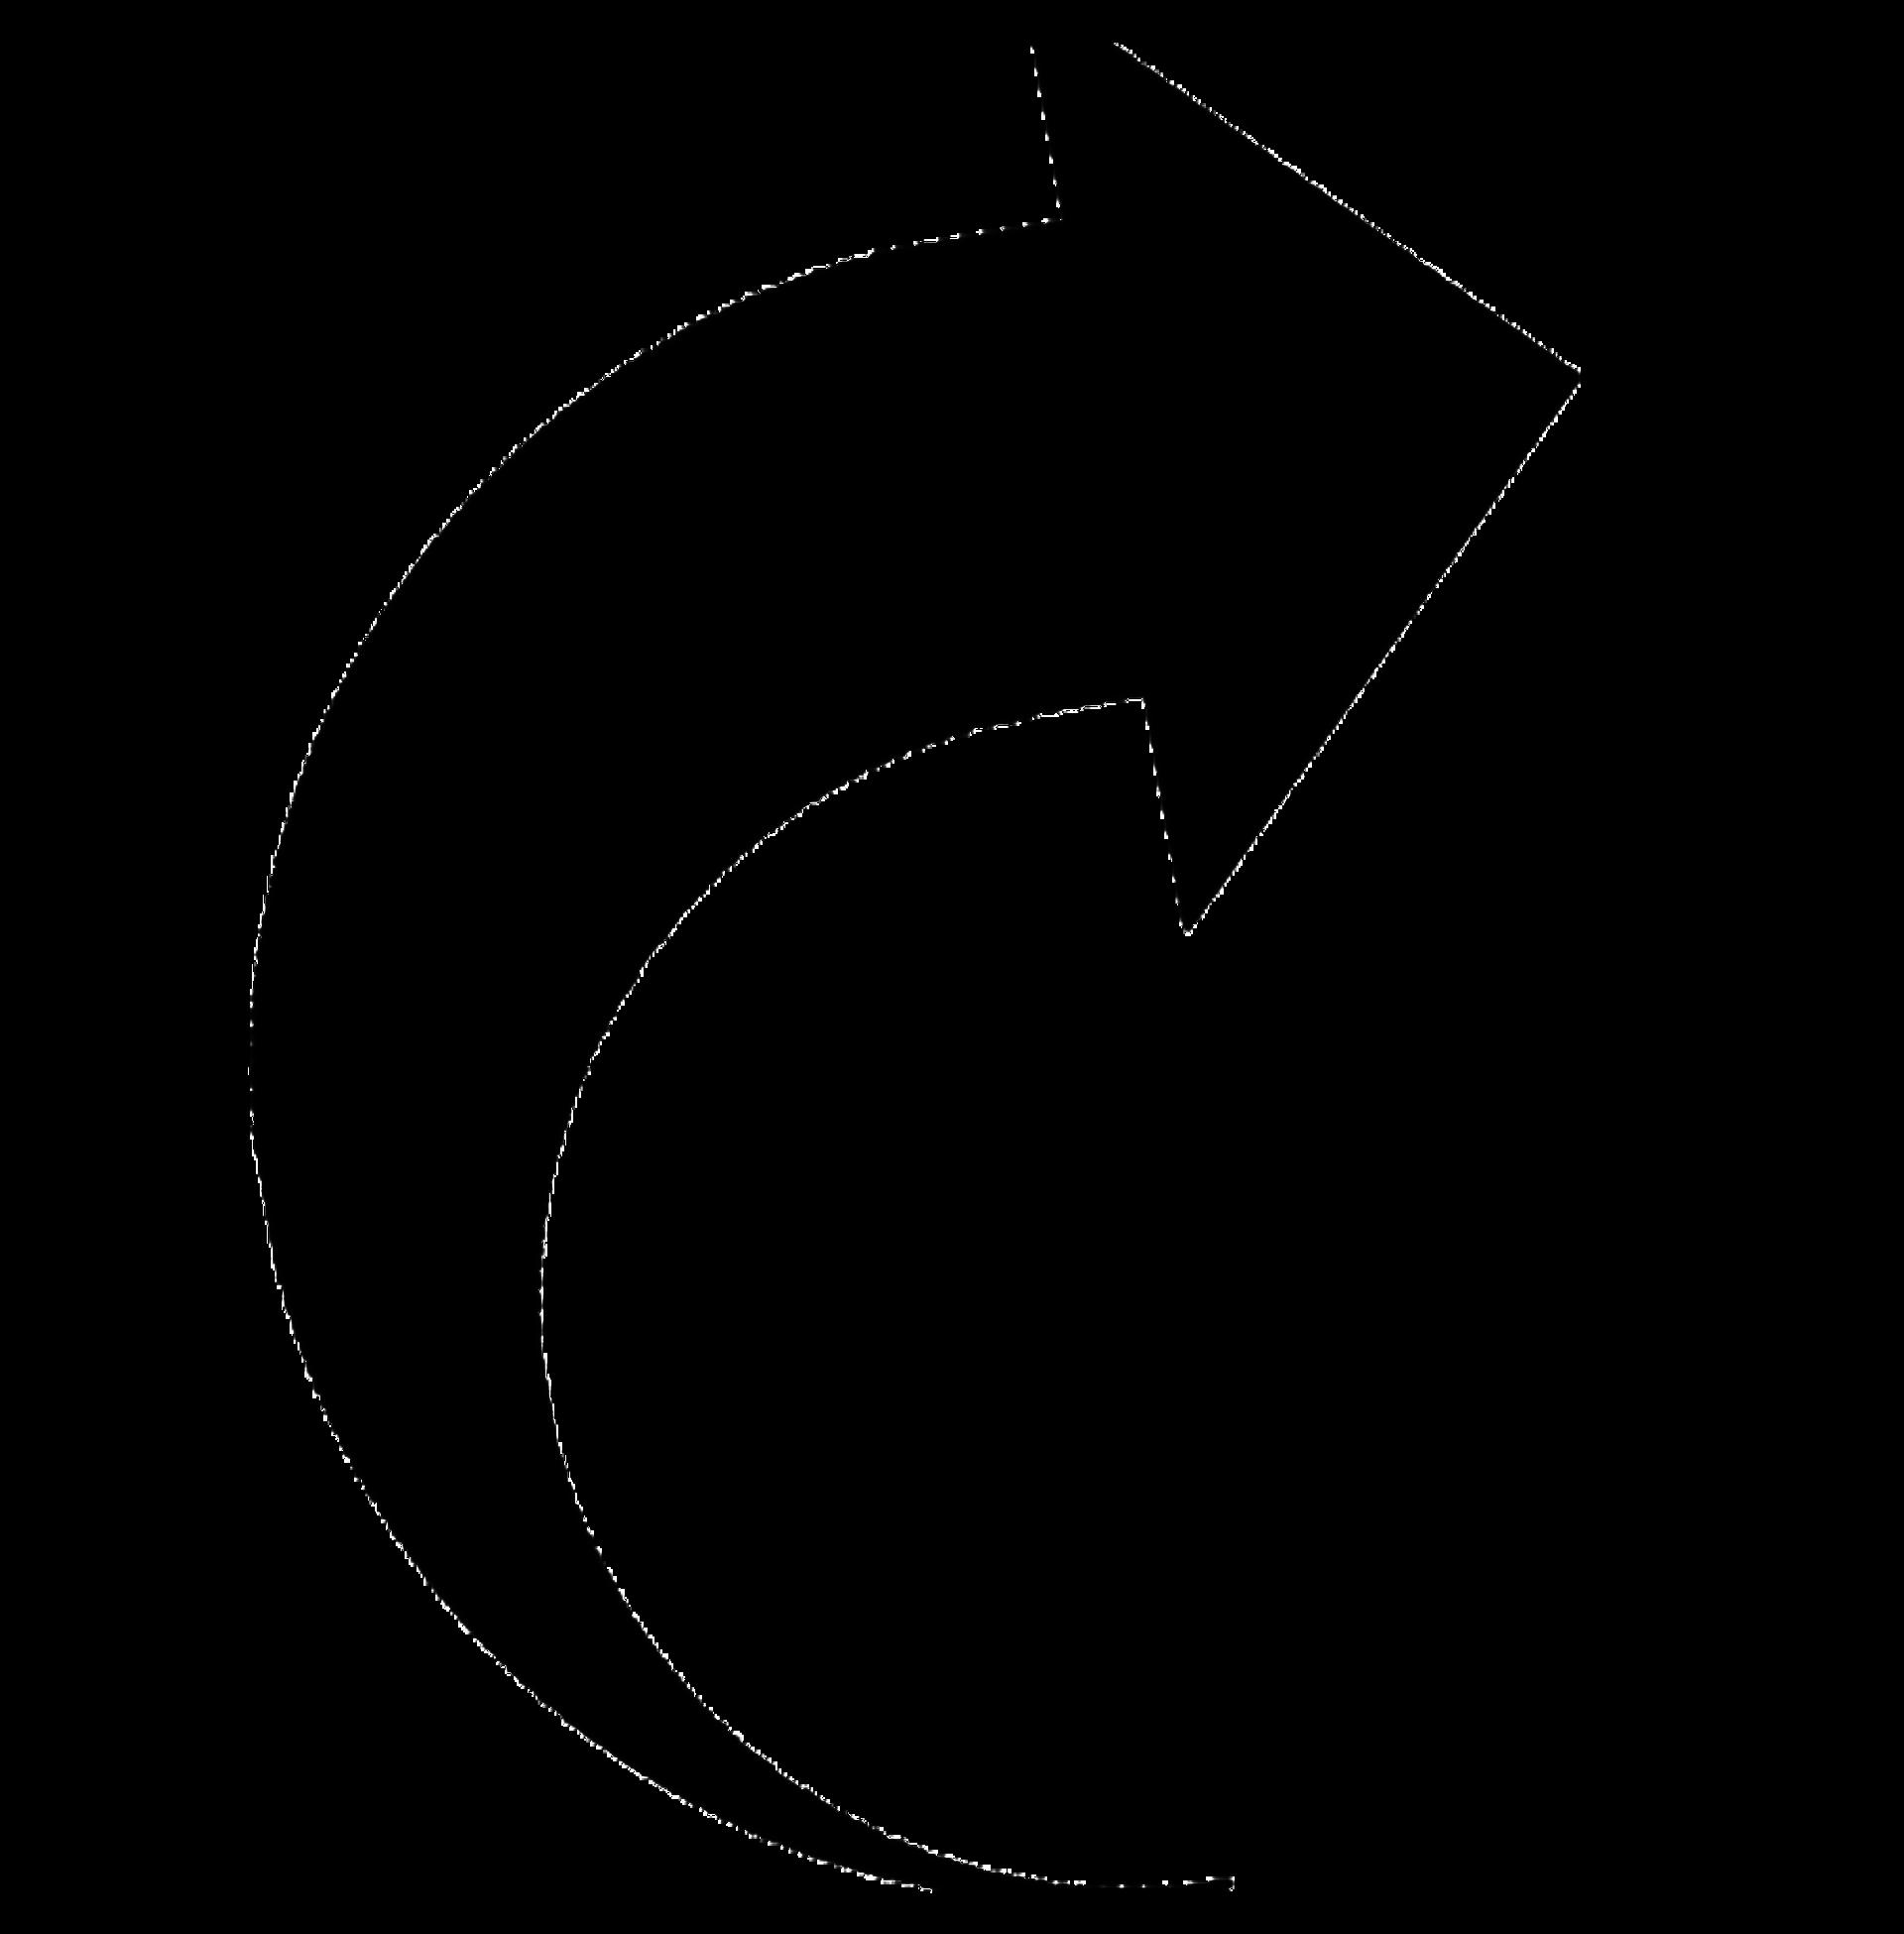 Default component image d9df610a062d6350ba4e624b7c61764658ea275e763d483673be89dc3607fbd4